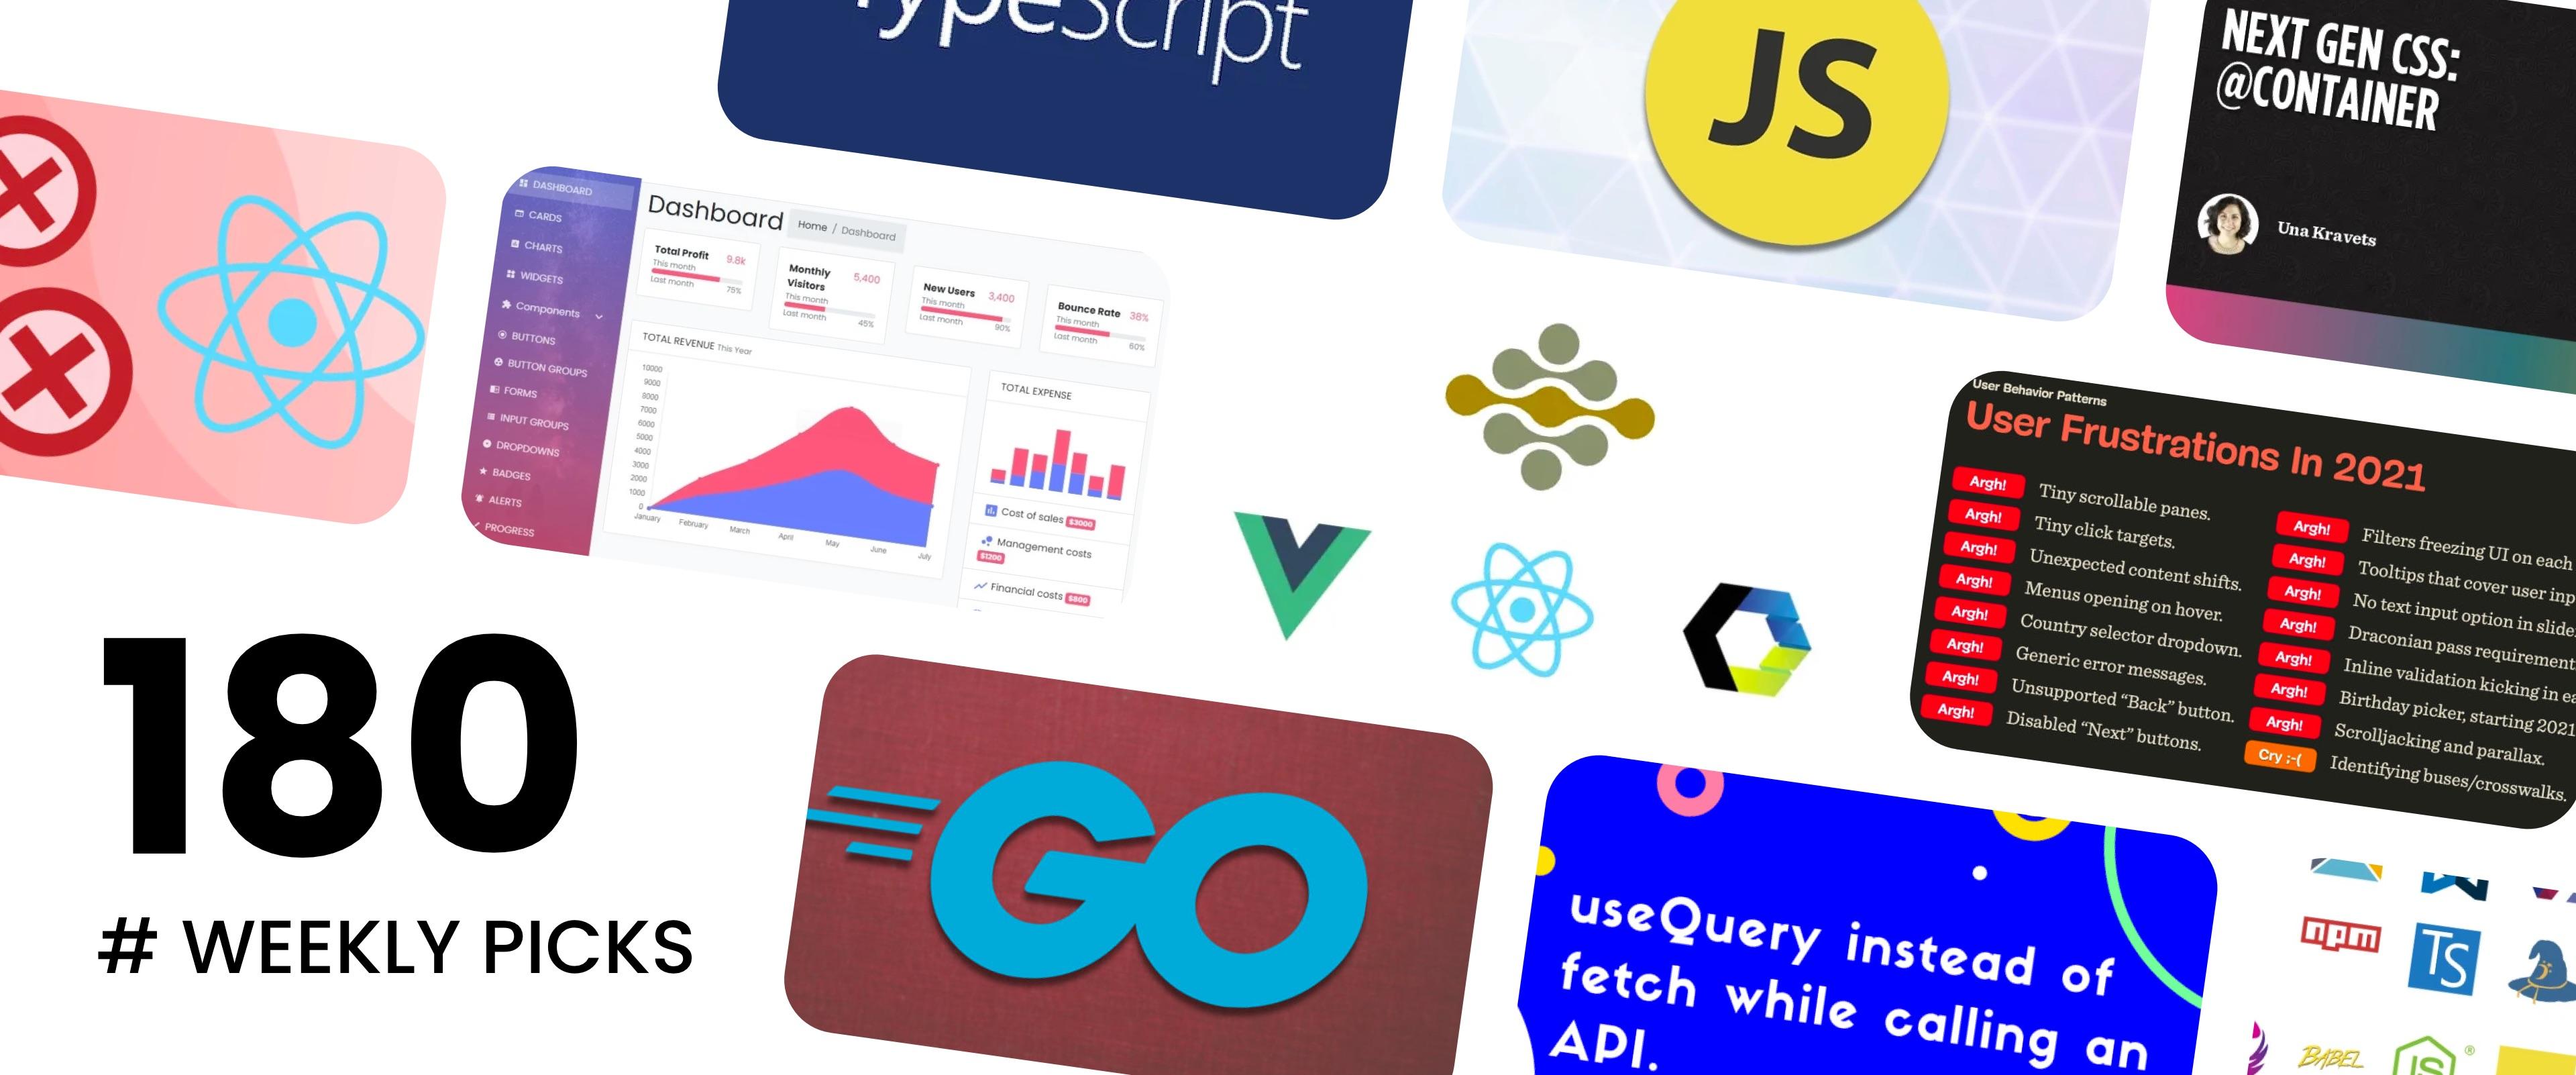 Next-Gen CSS, OSS needs you, testing best practices - Picks #180